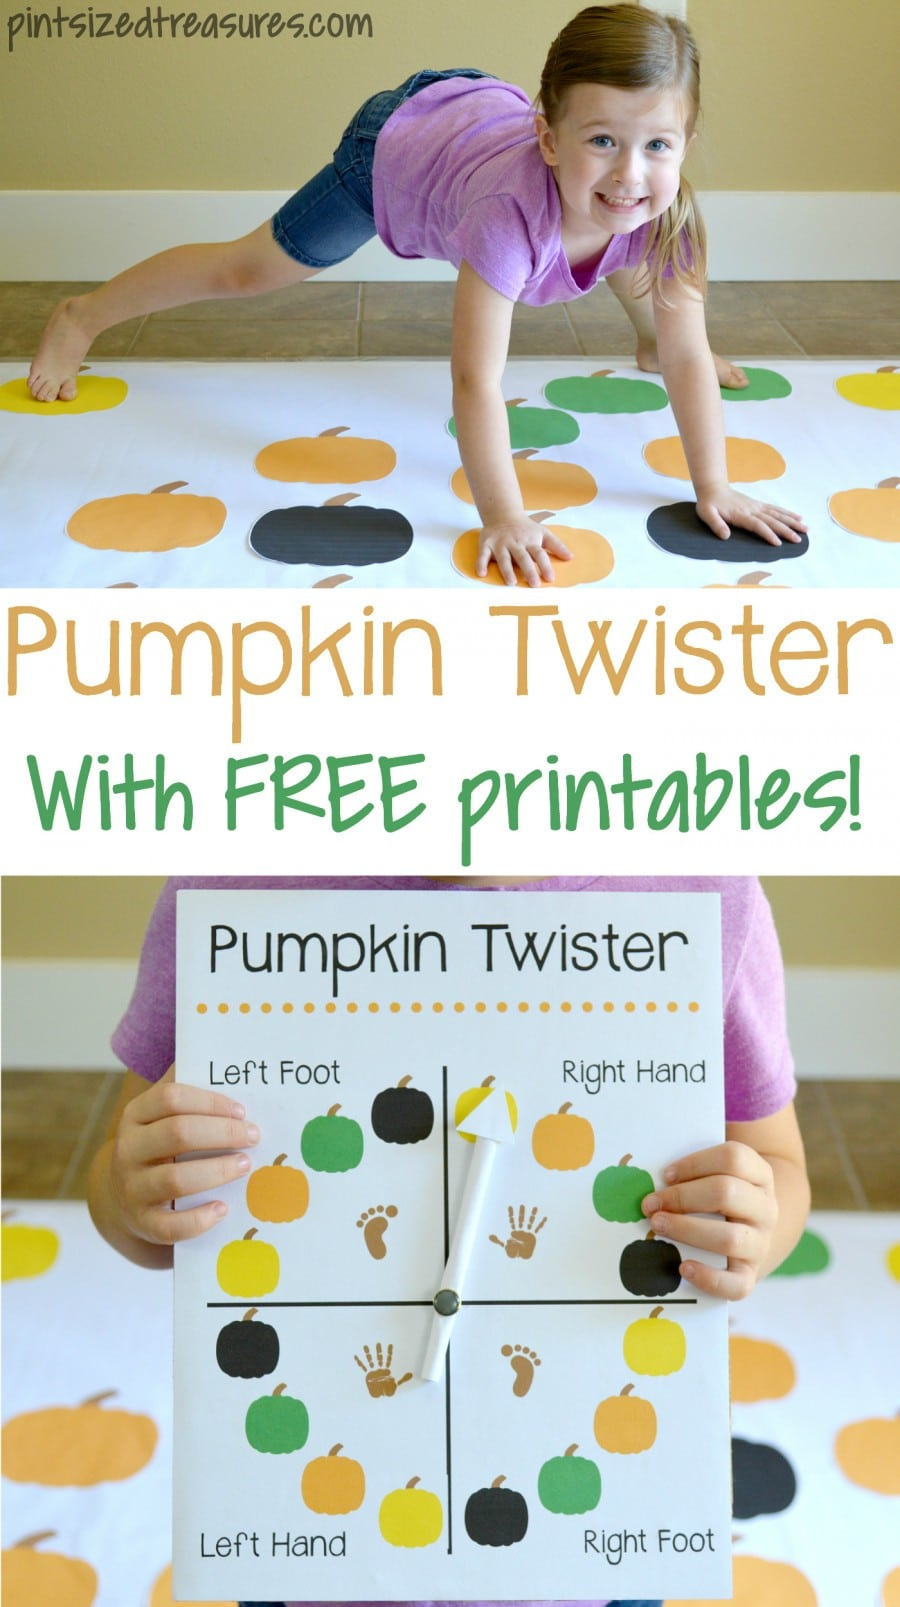 Pumpkin twister game